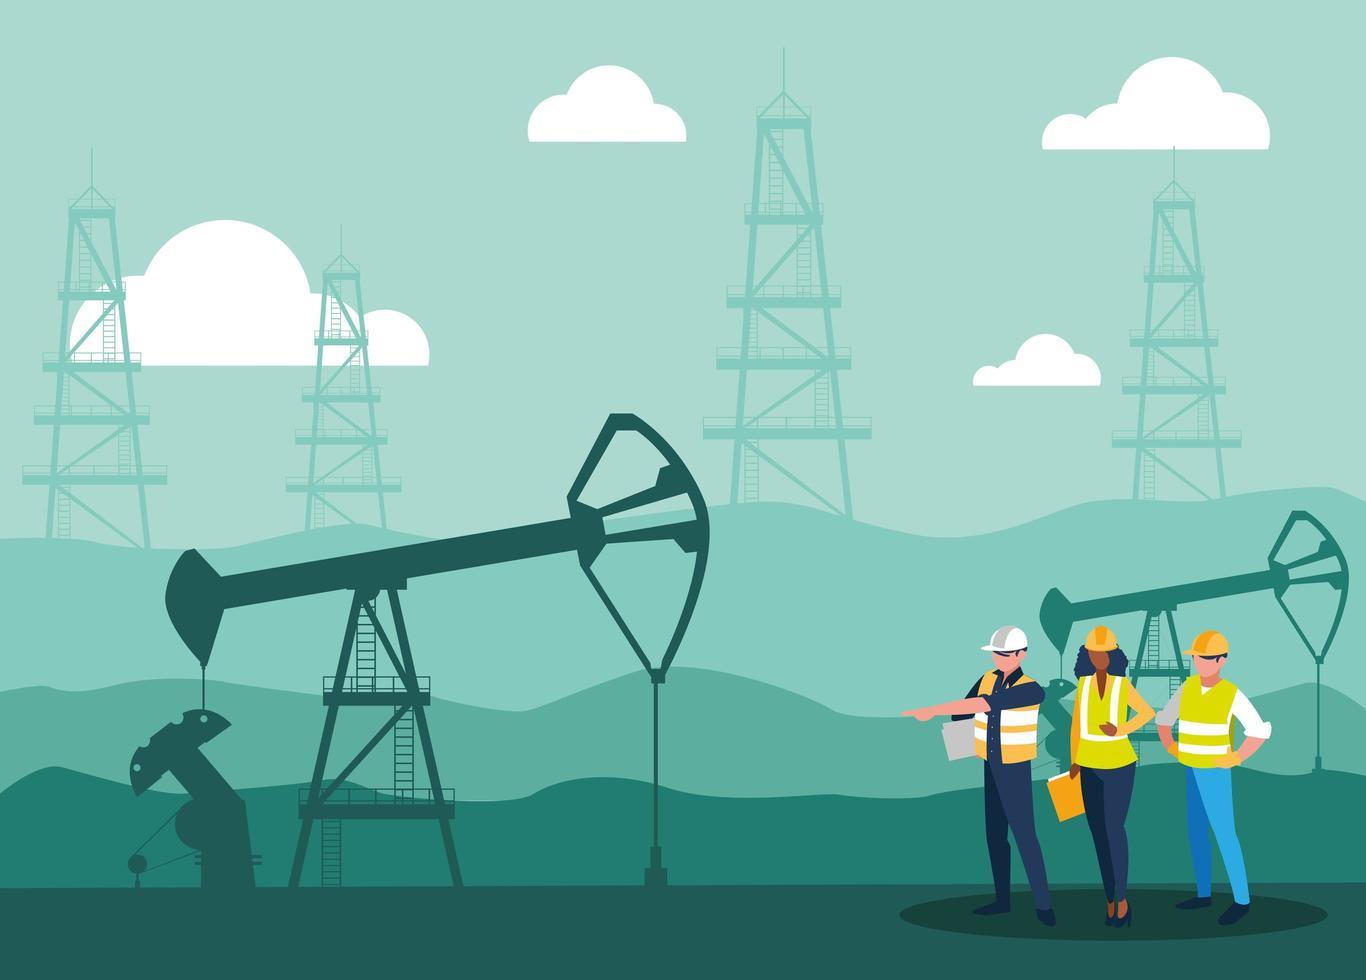 Teamarbeiter fördern Öl vektor